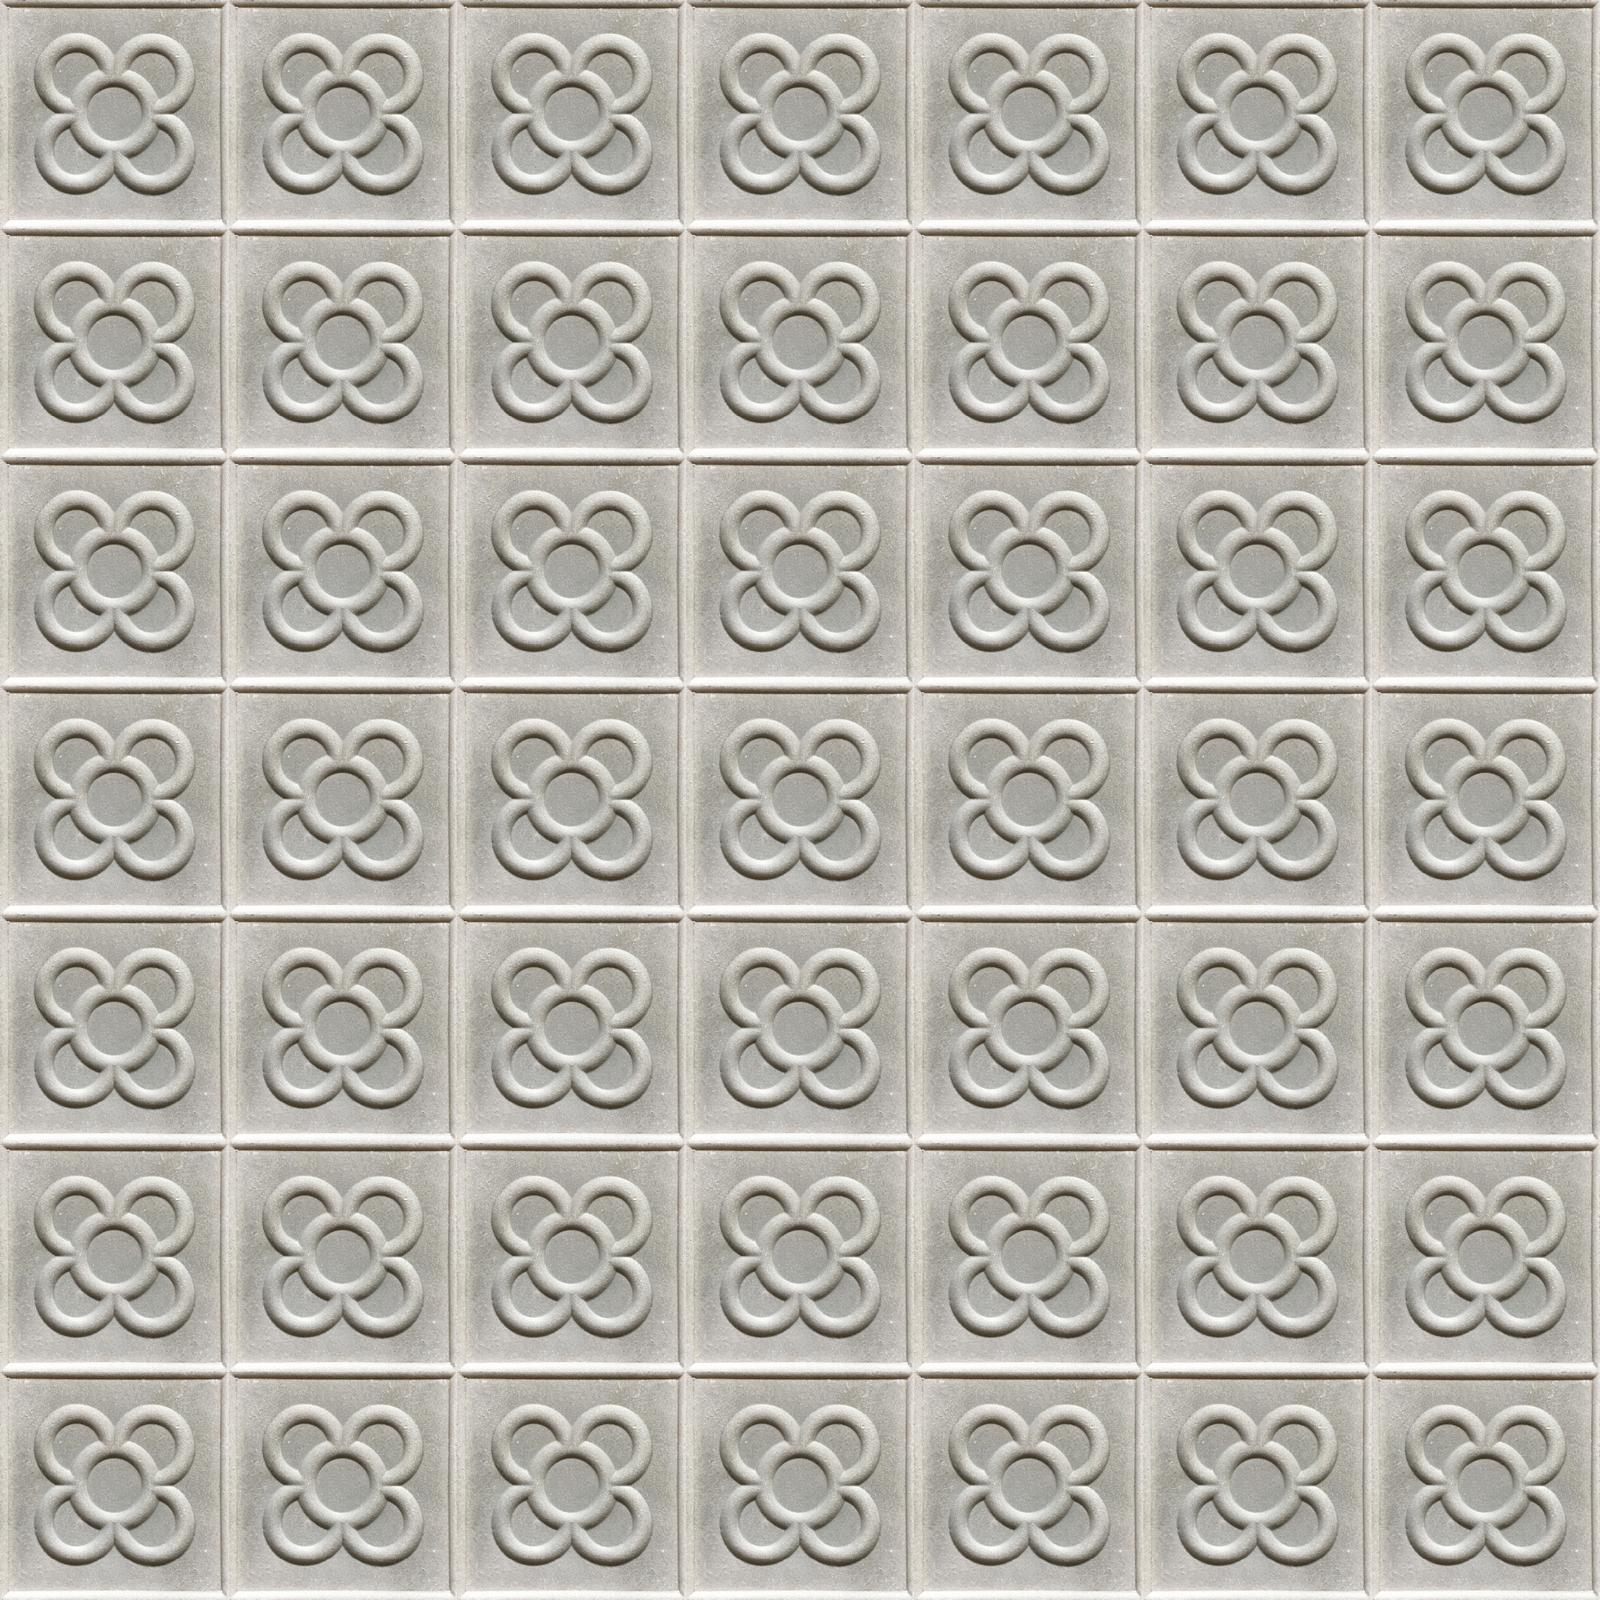 trottoirplatten-AP13-verlegemuster-01 | AP13